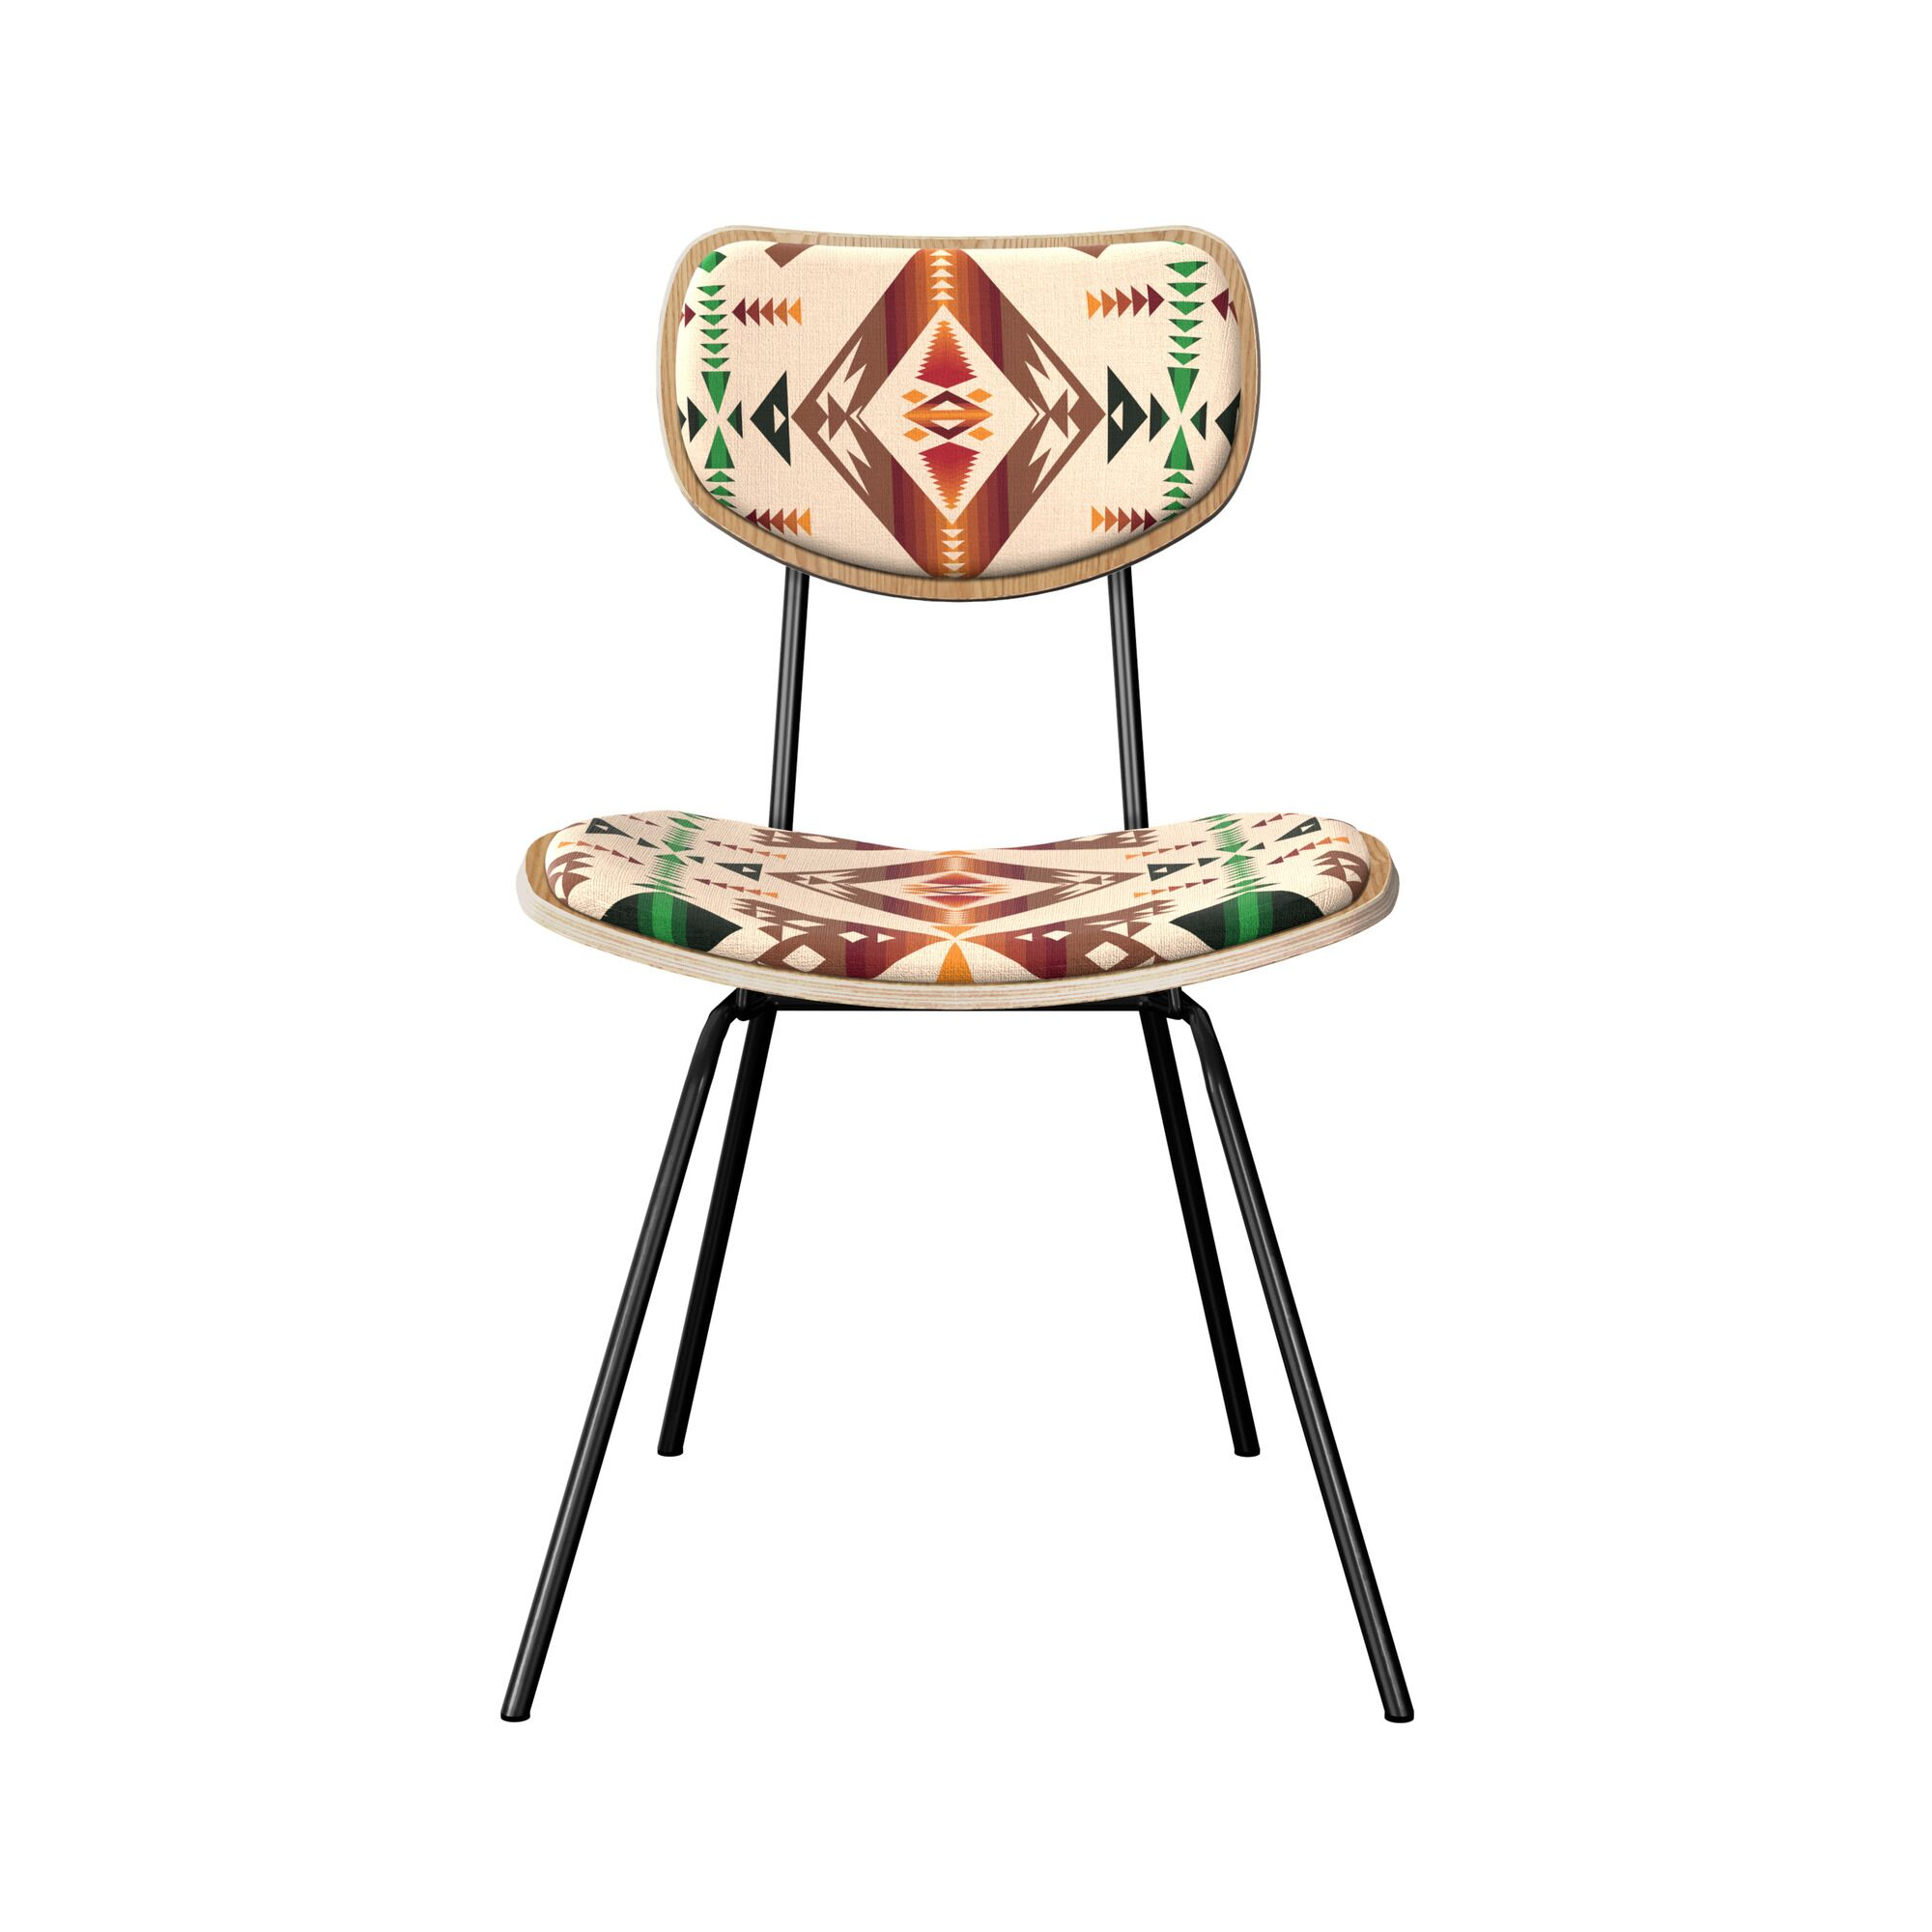 Champlin Upholstered Dining Chair Leg Color: Black, Frame Color: Natural